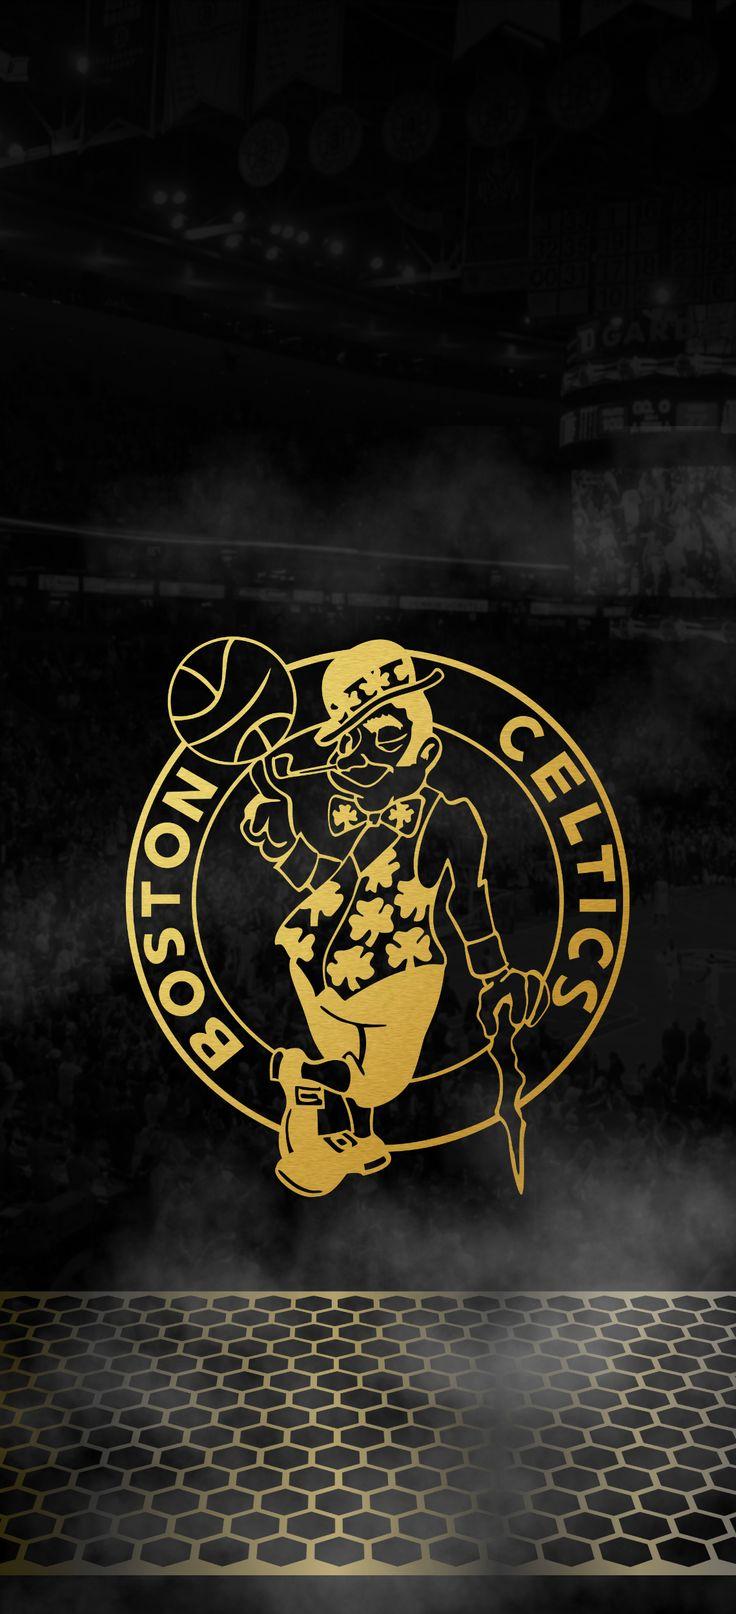 sportsign Shop Boston celtics wallpaper, Boston celtics